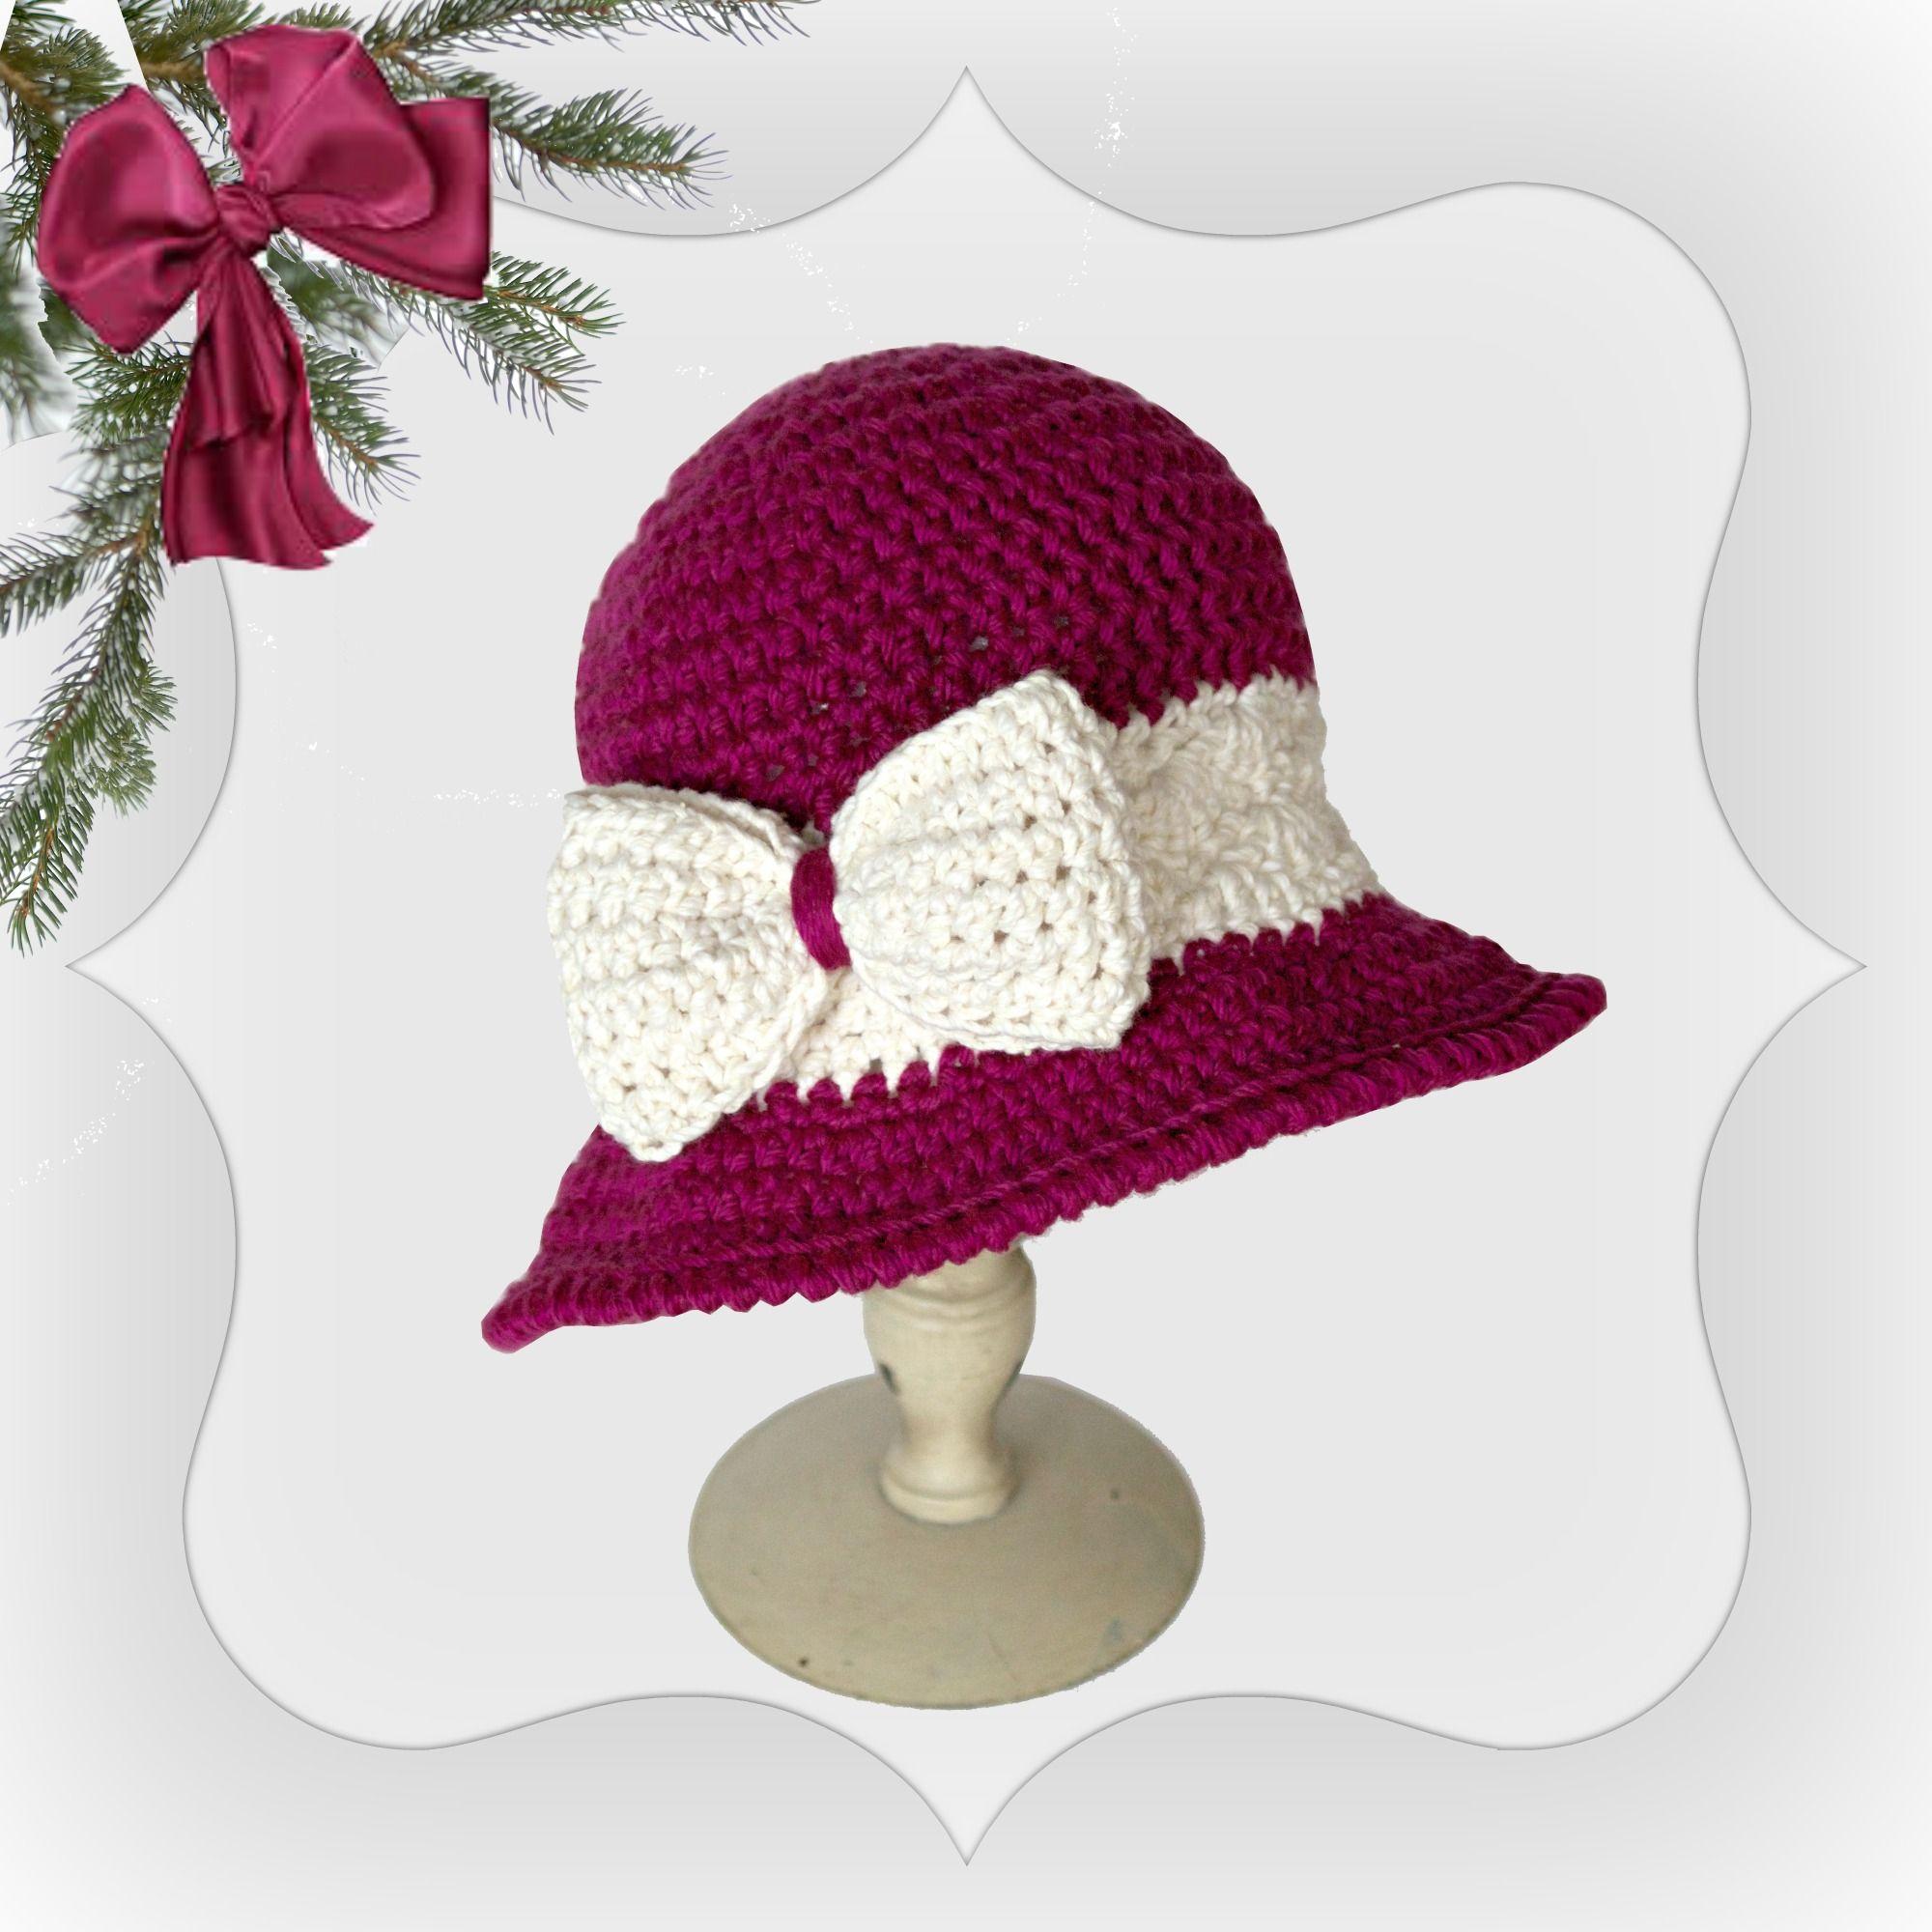 FREE Crochet Pattern - Holiday Joy | maglia e uncinetto | Pinterest ...